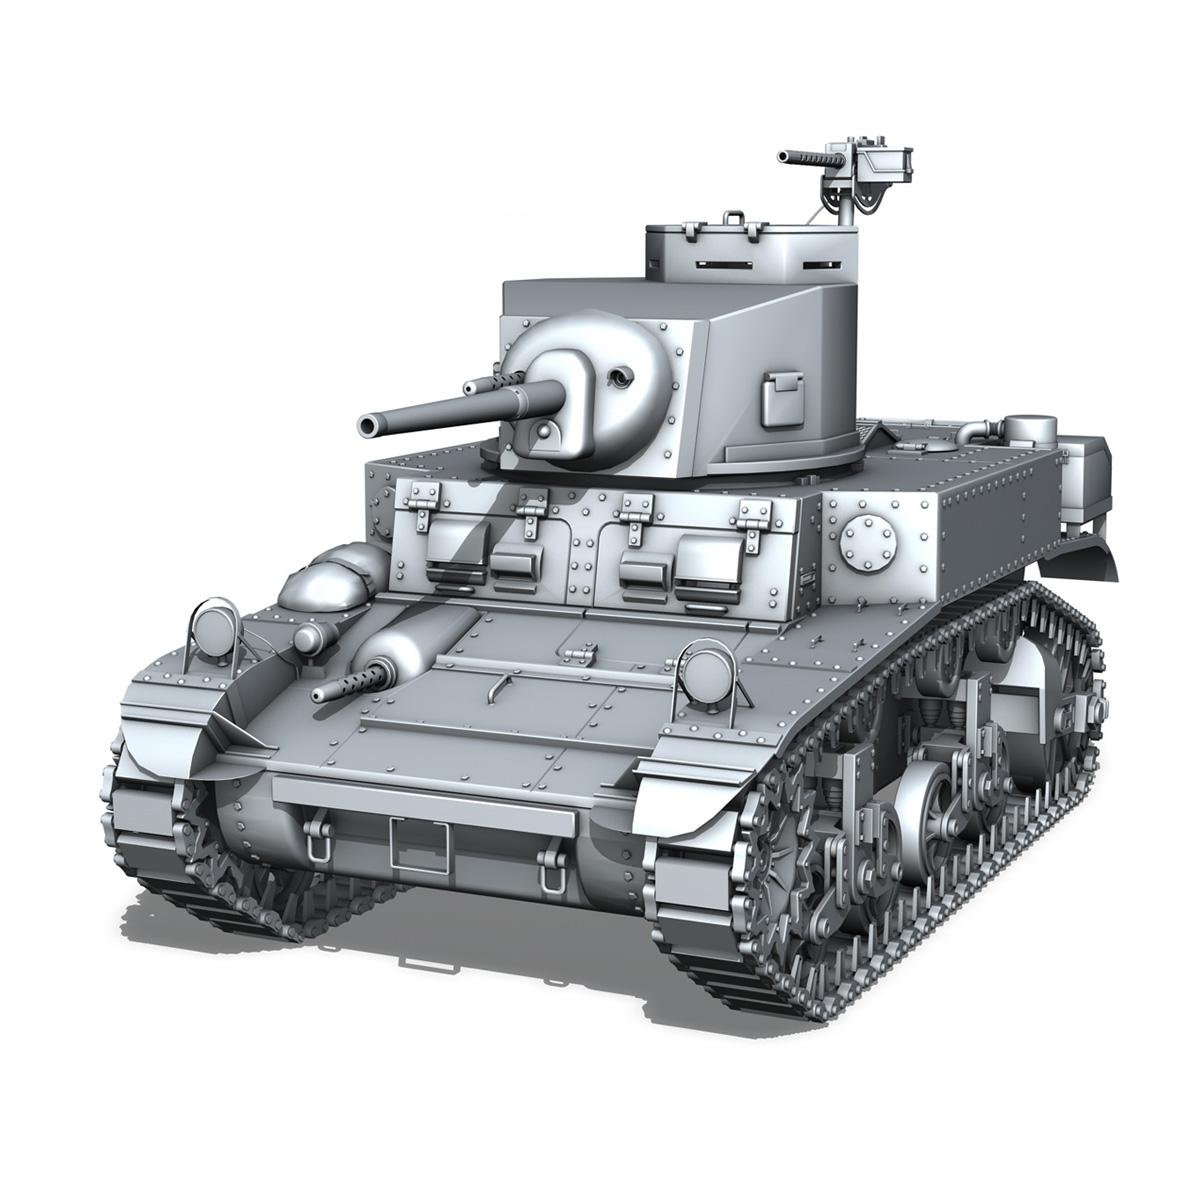 m3 light tank stuart – early production 3d model 3ds fbx c4d lwo obj 189170